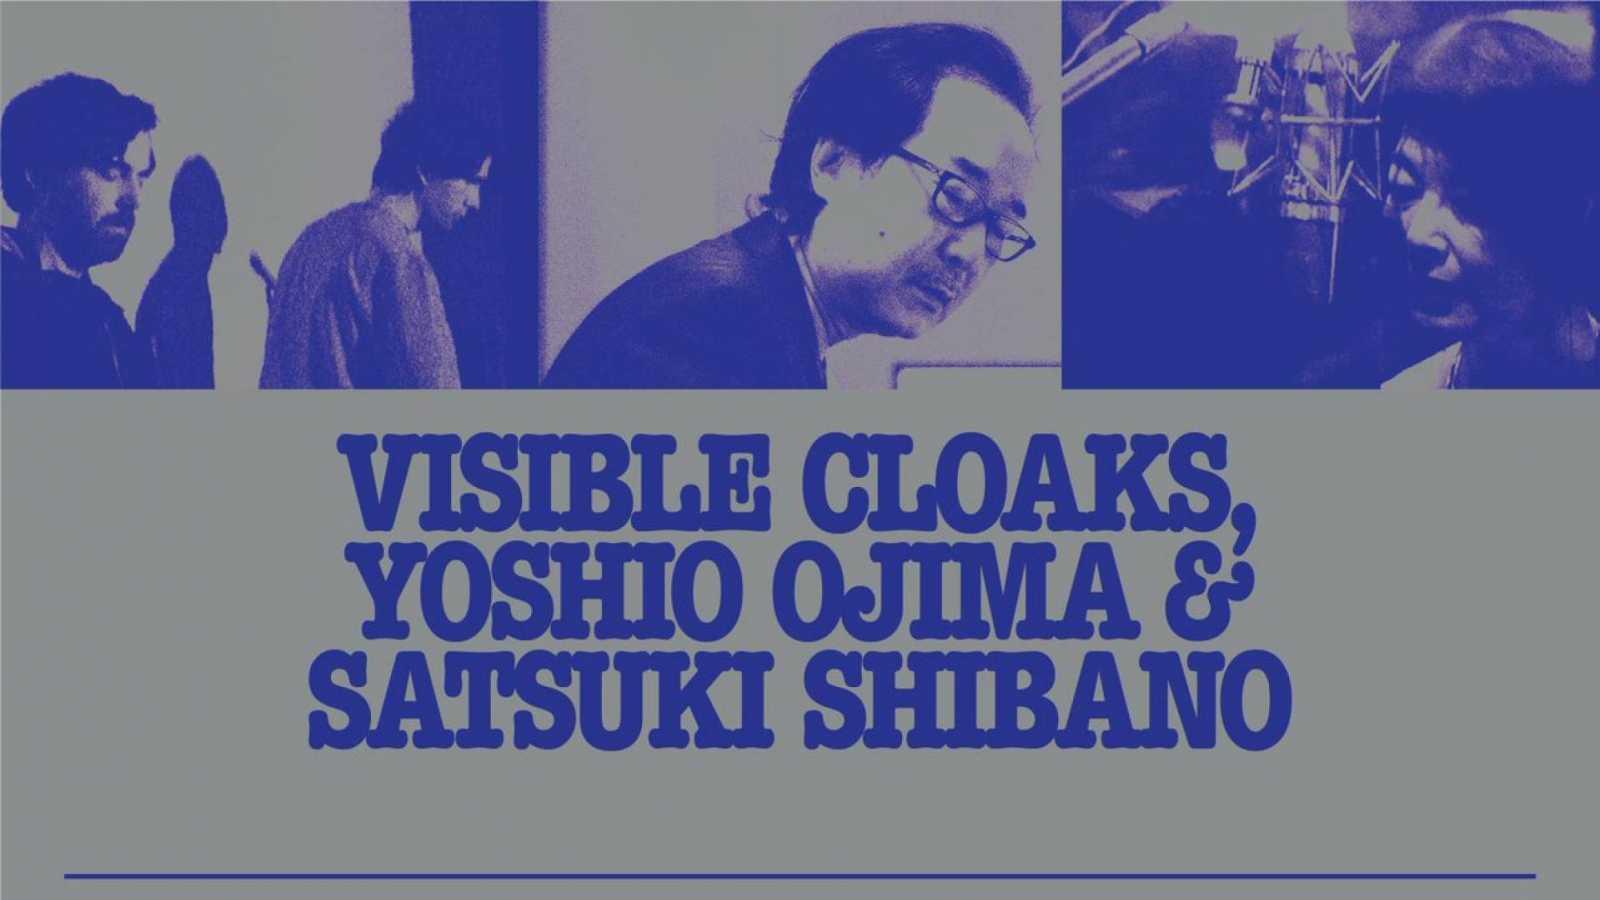 Visible Cloaks, Yoshio Ojima & Satsuki Shibano © All Rights Reserved.